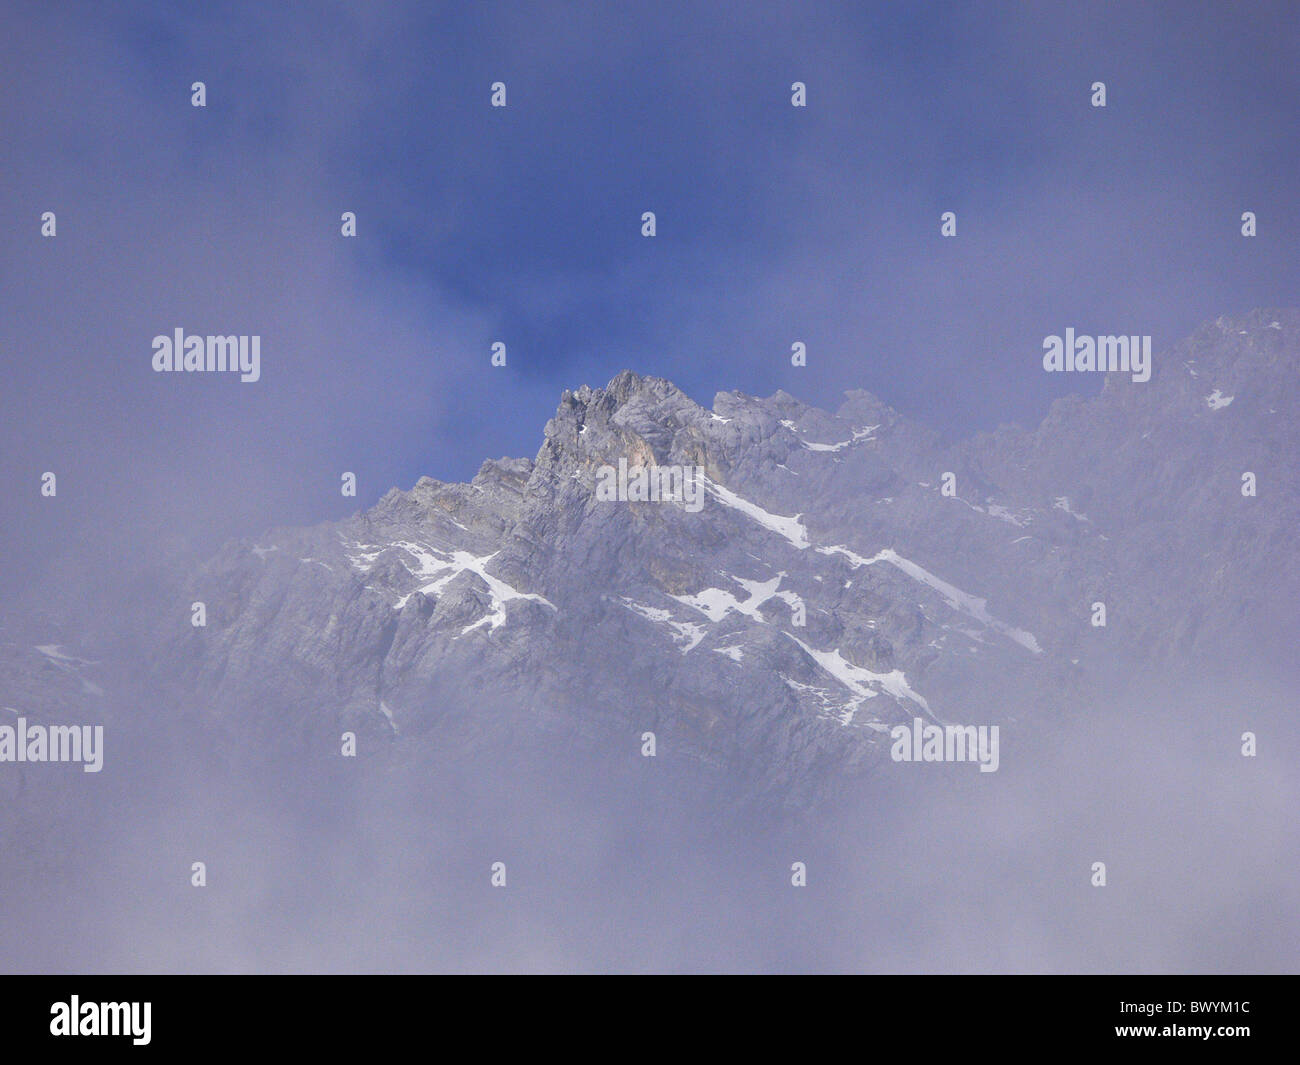 Rocky peaks of Yulong Snow Mountain in summer, Yulong Naxi Autonomous County, Lijiang, Yunnan Province, China - Stock Image